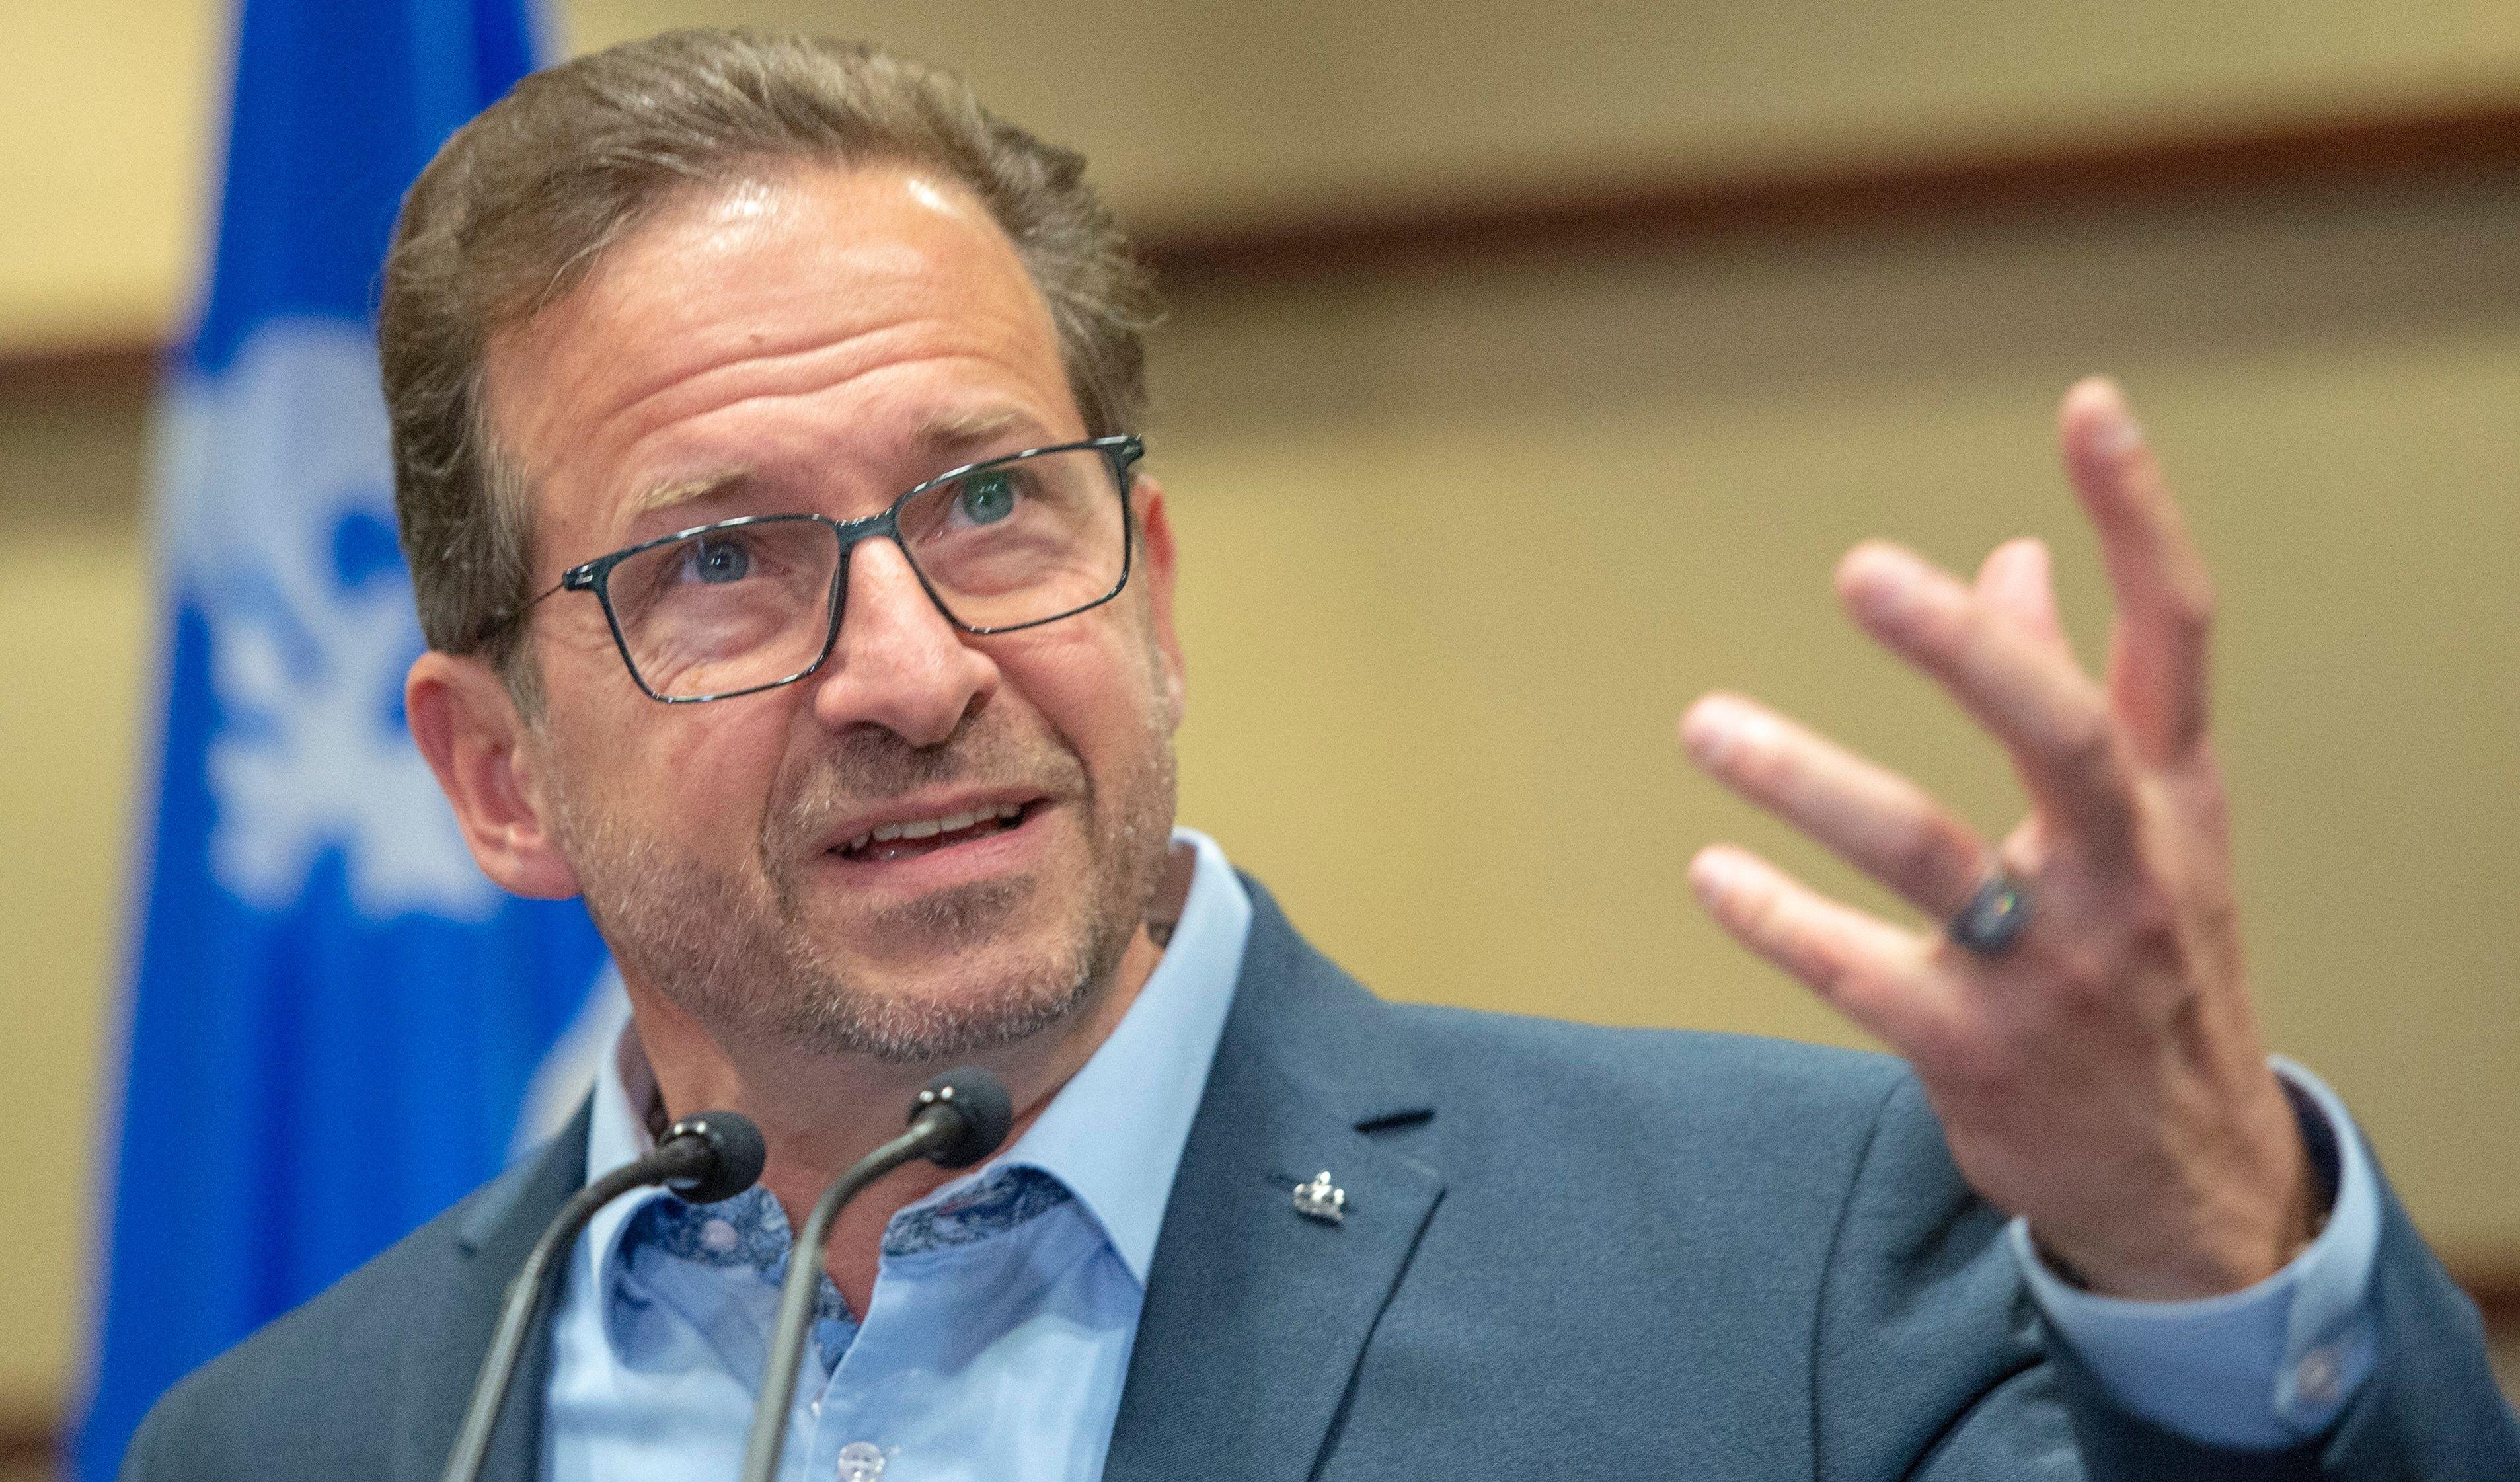 Bloc Quebecois Leader Yves Francois Blanchet Prepared To